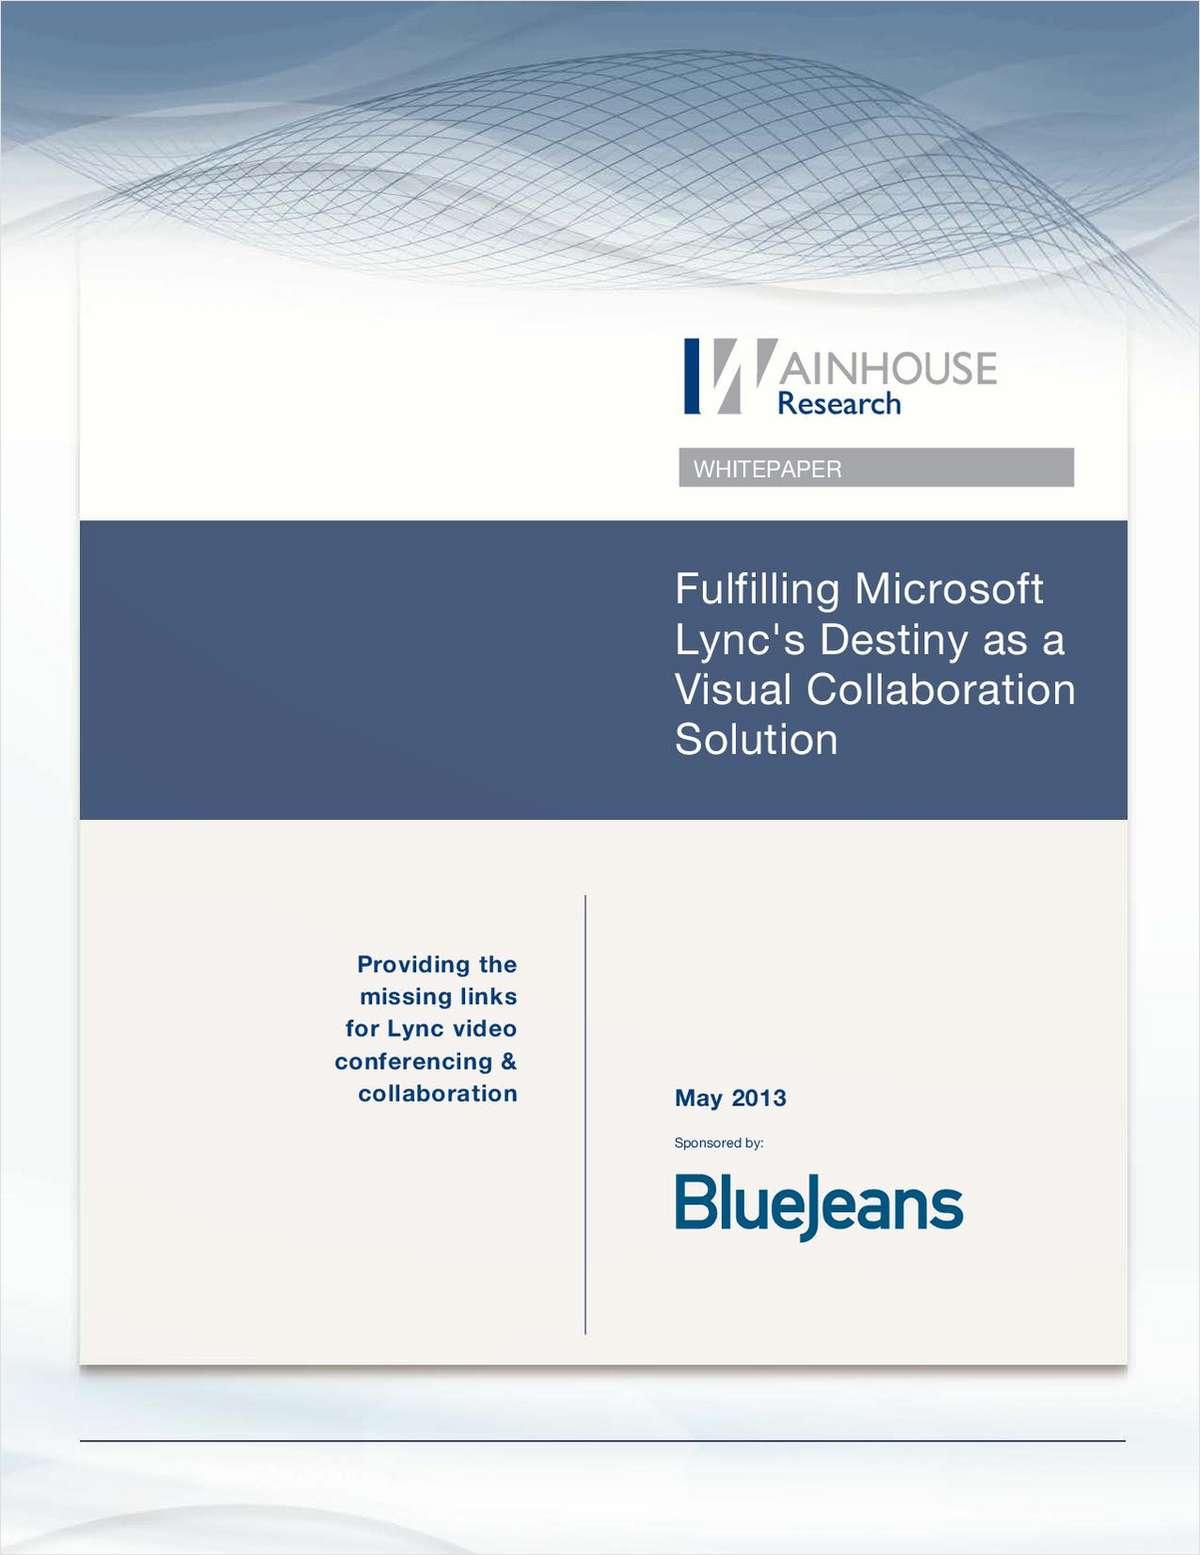 Fulfilling Microsoft Lync's Destiny as a Visual Collaboration Solution